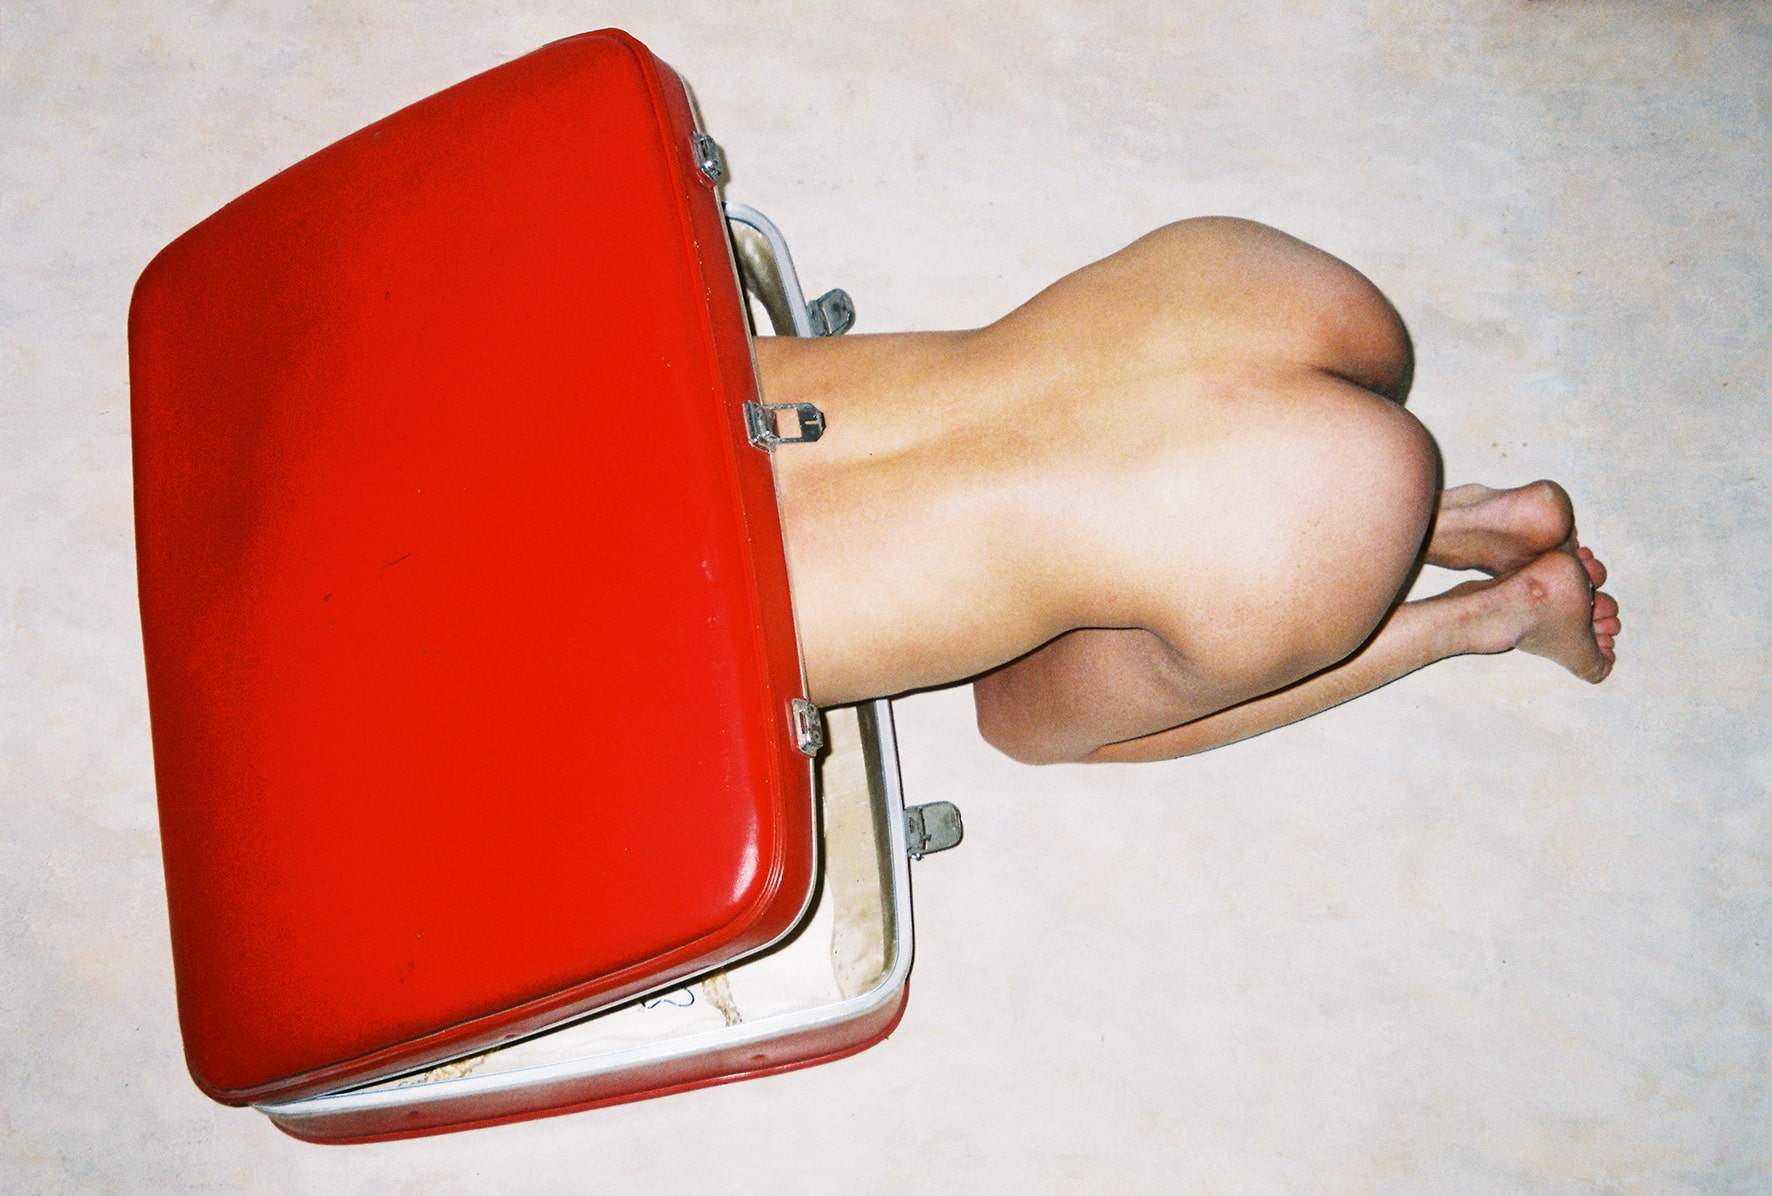 2011_06 (2011). Impression jet d'encre. Ren Hang, courtesy of Galerie Paris-Beijing.